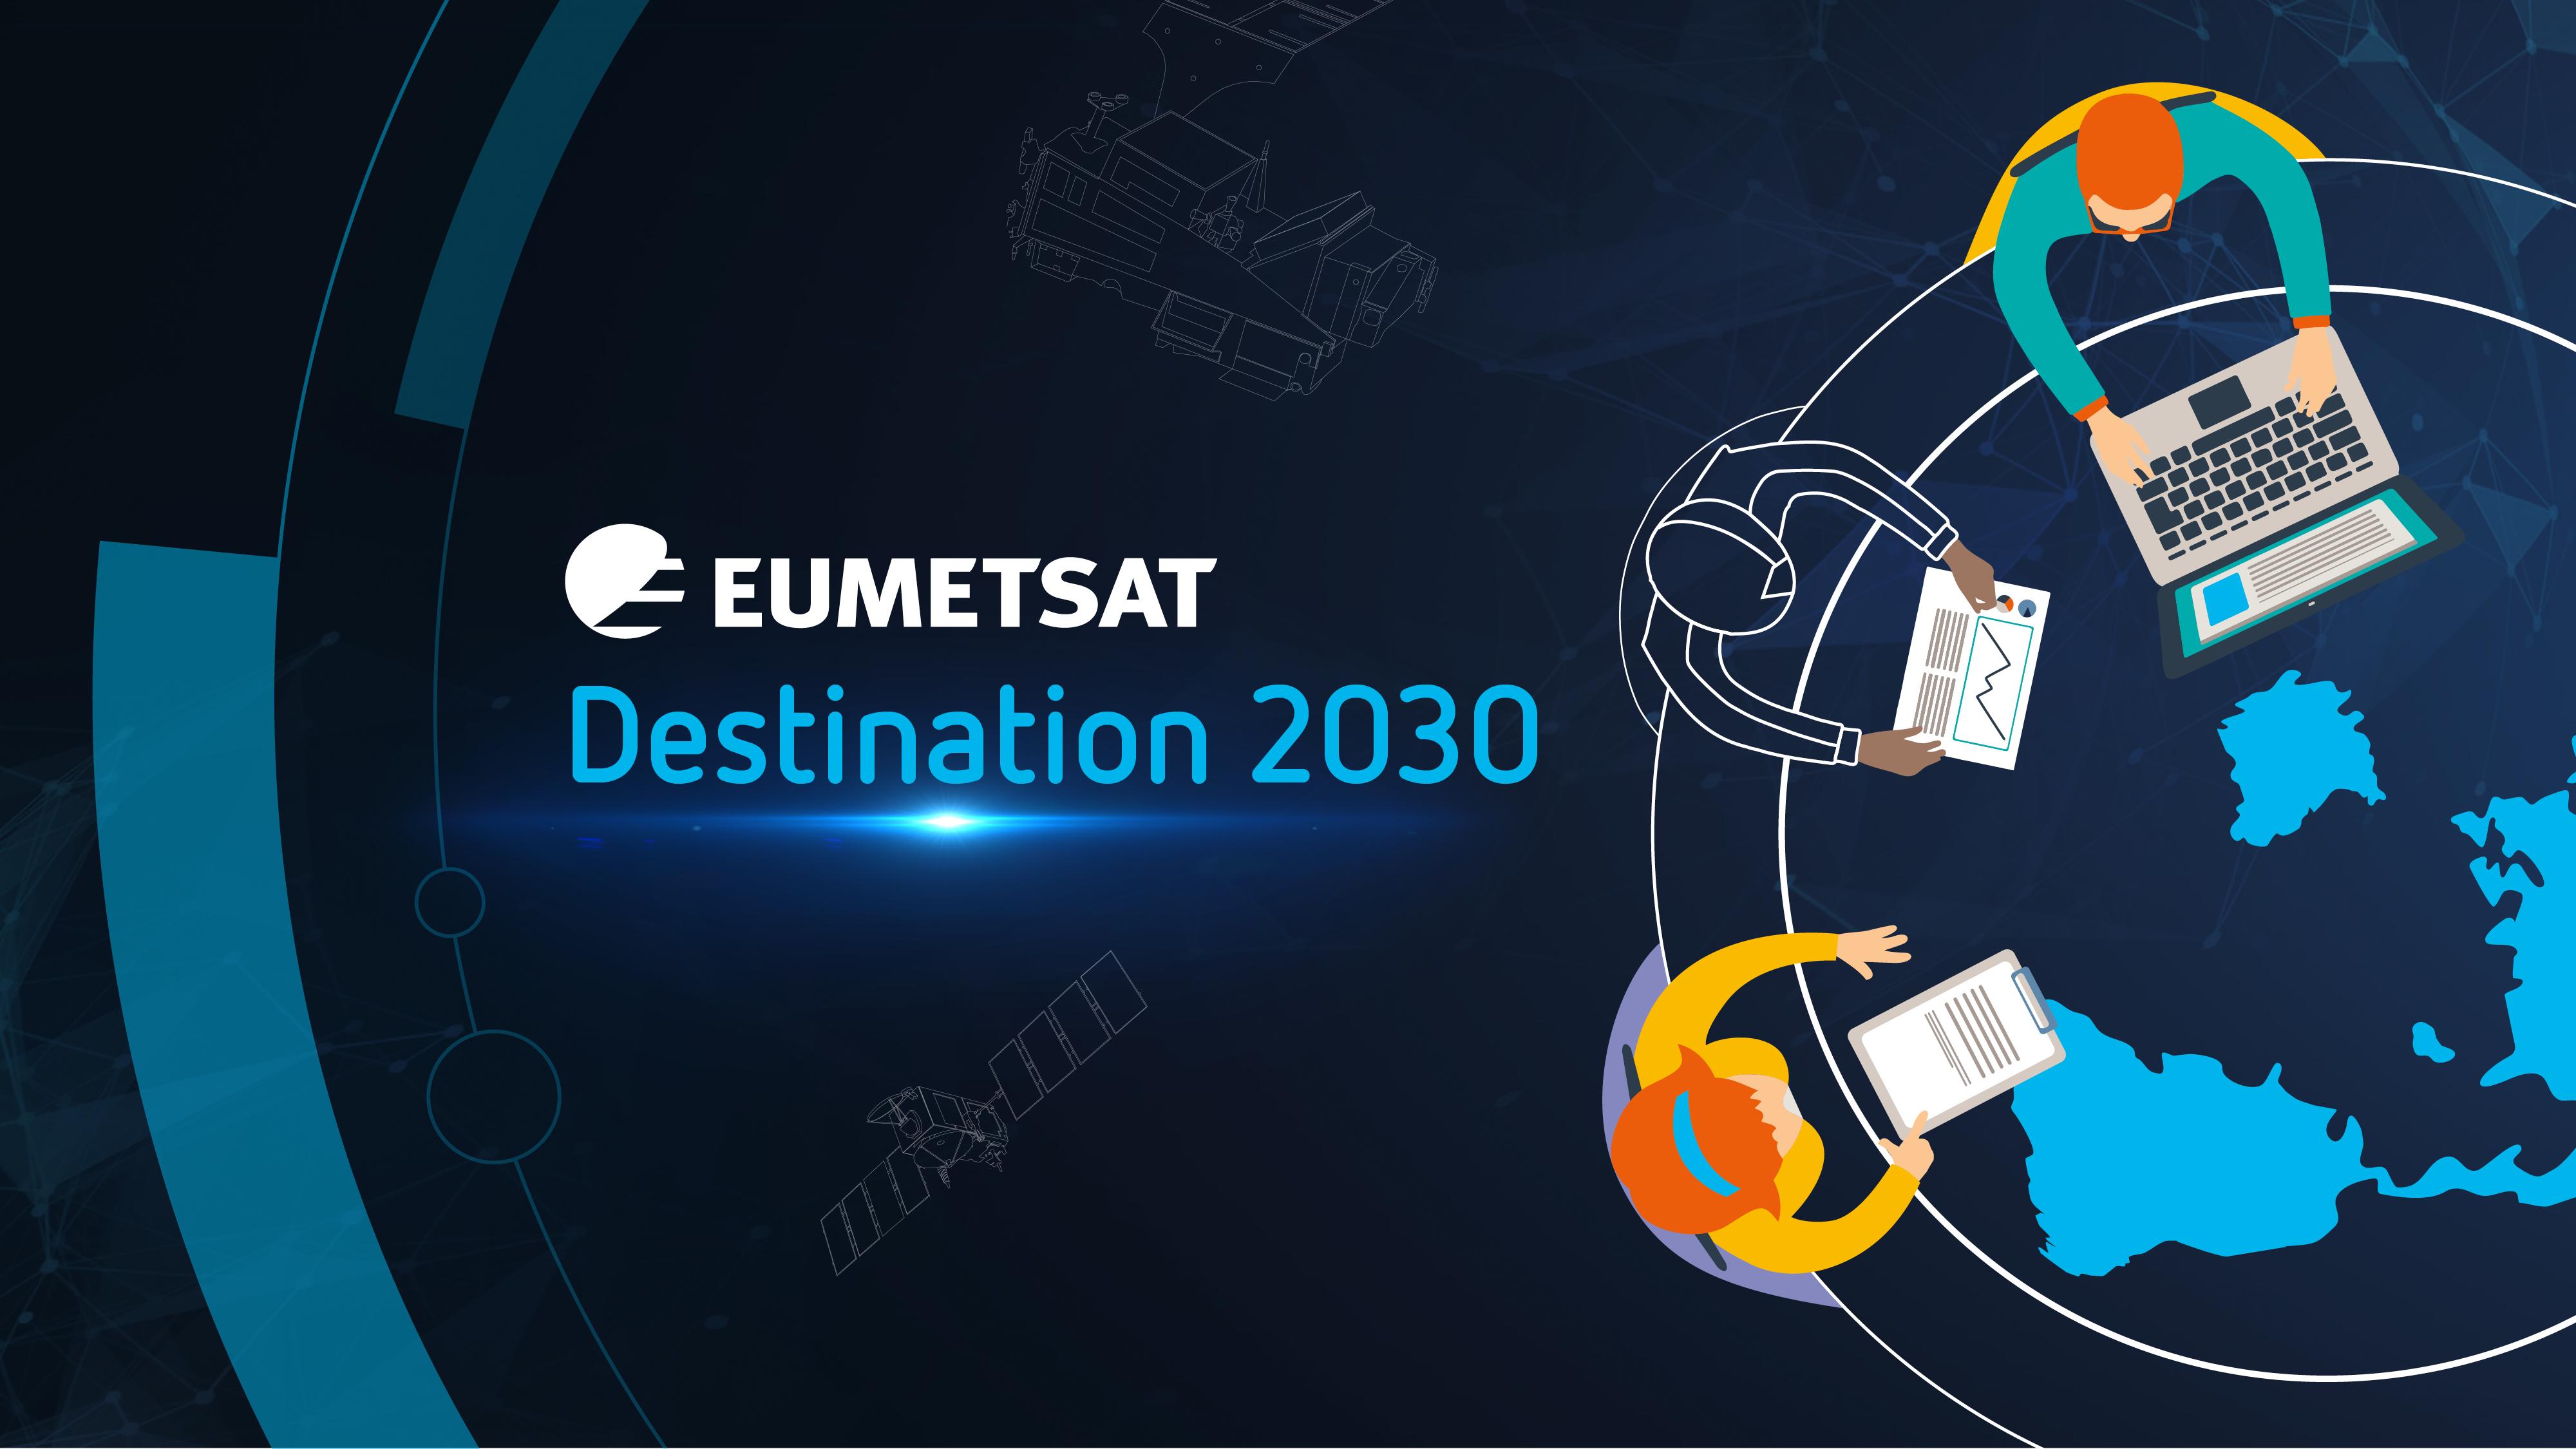 EUMETSAT Destination 2030